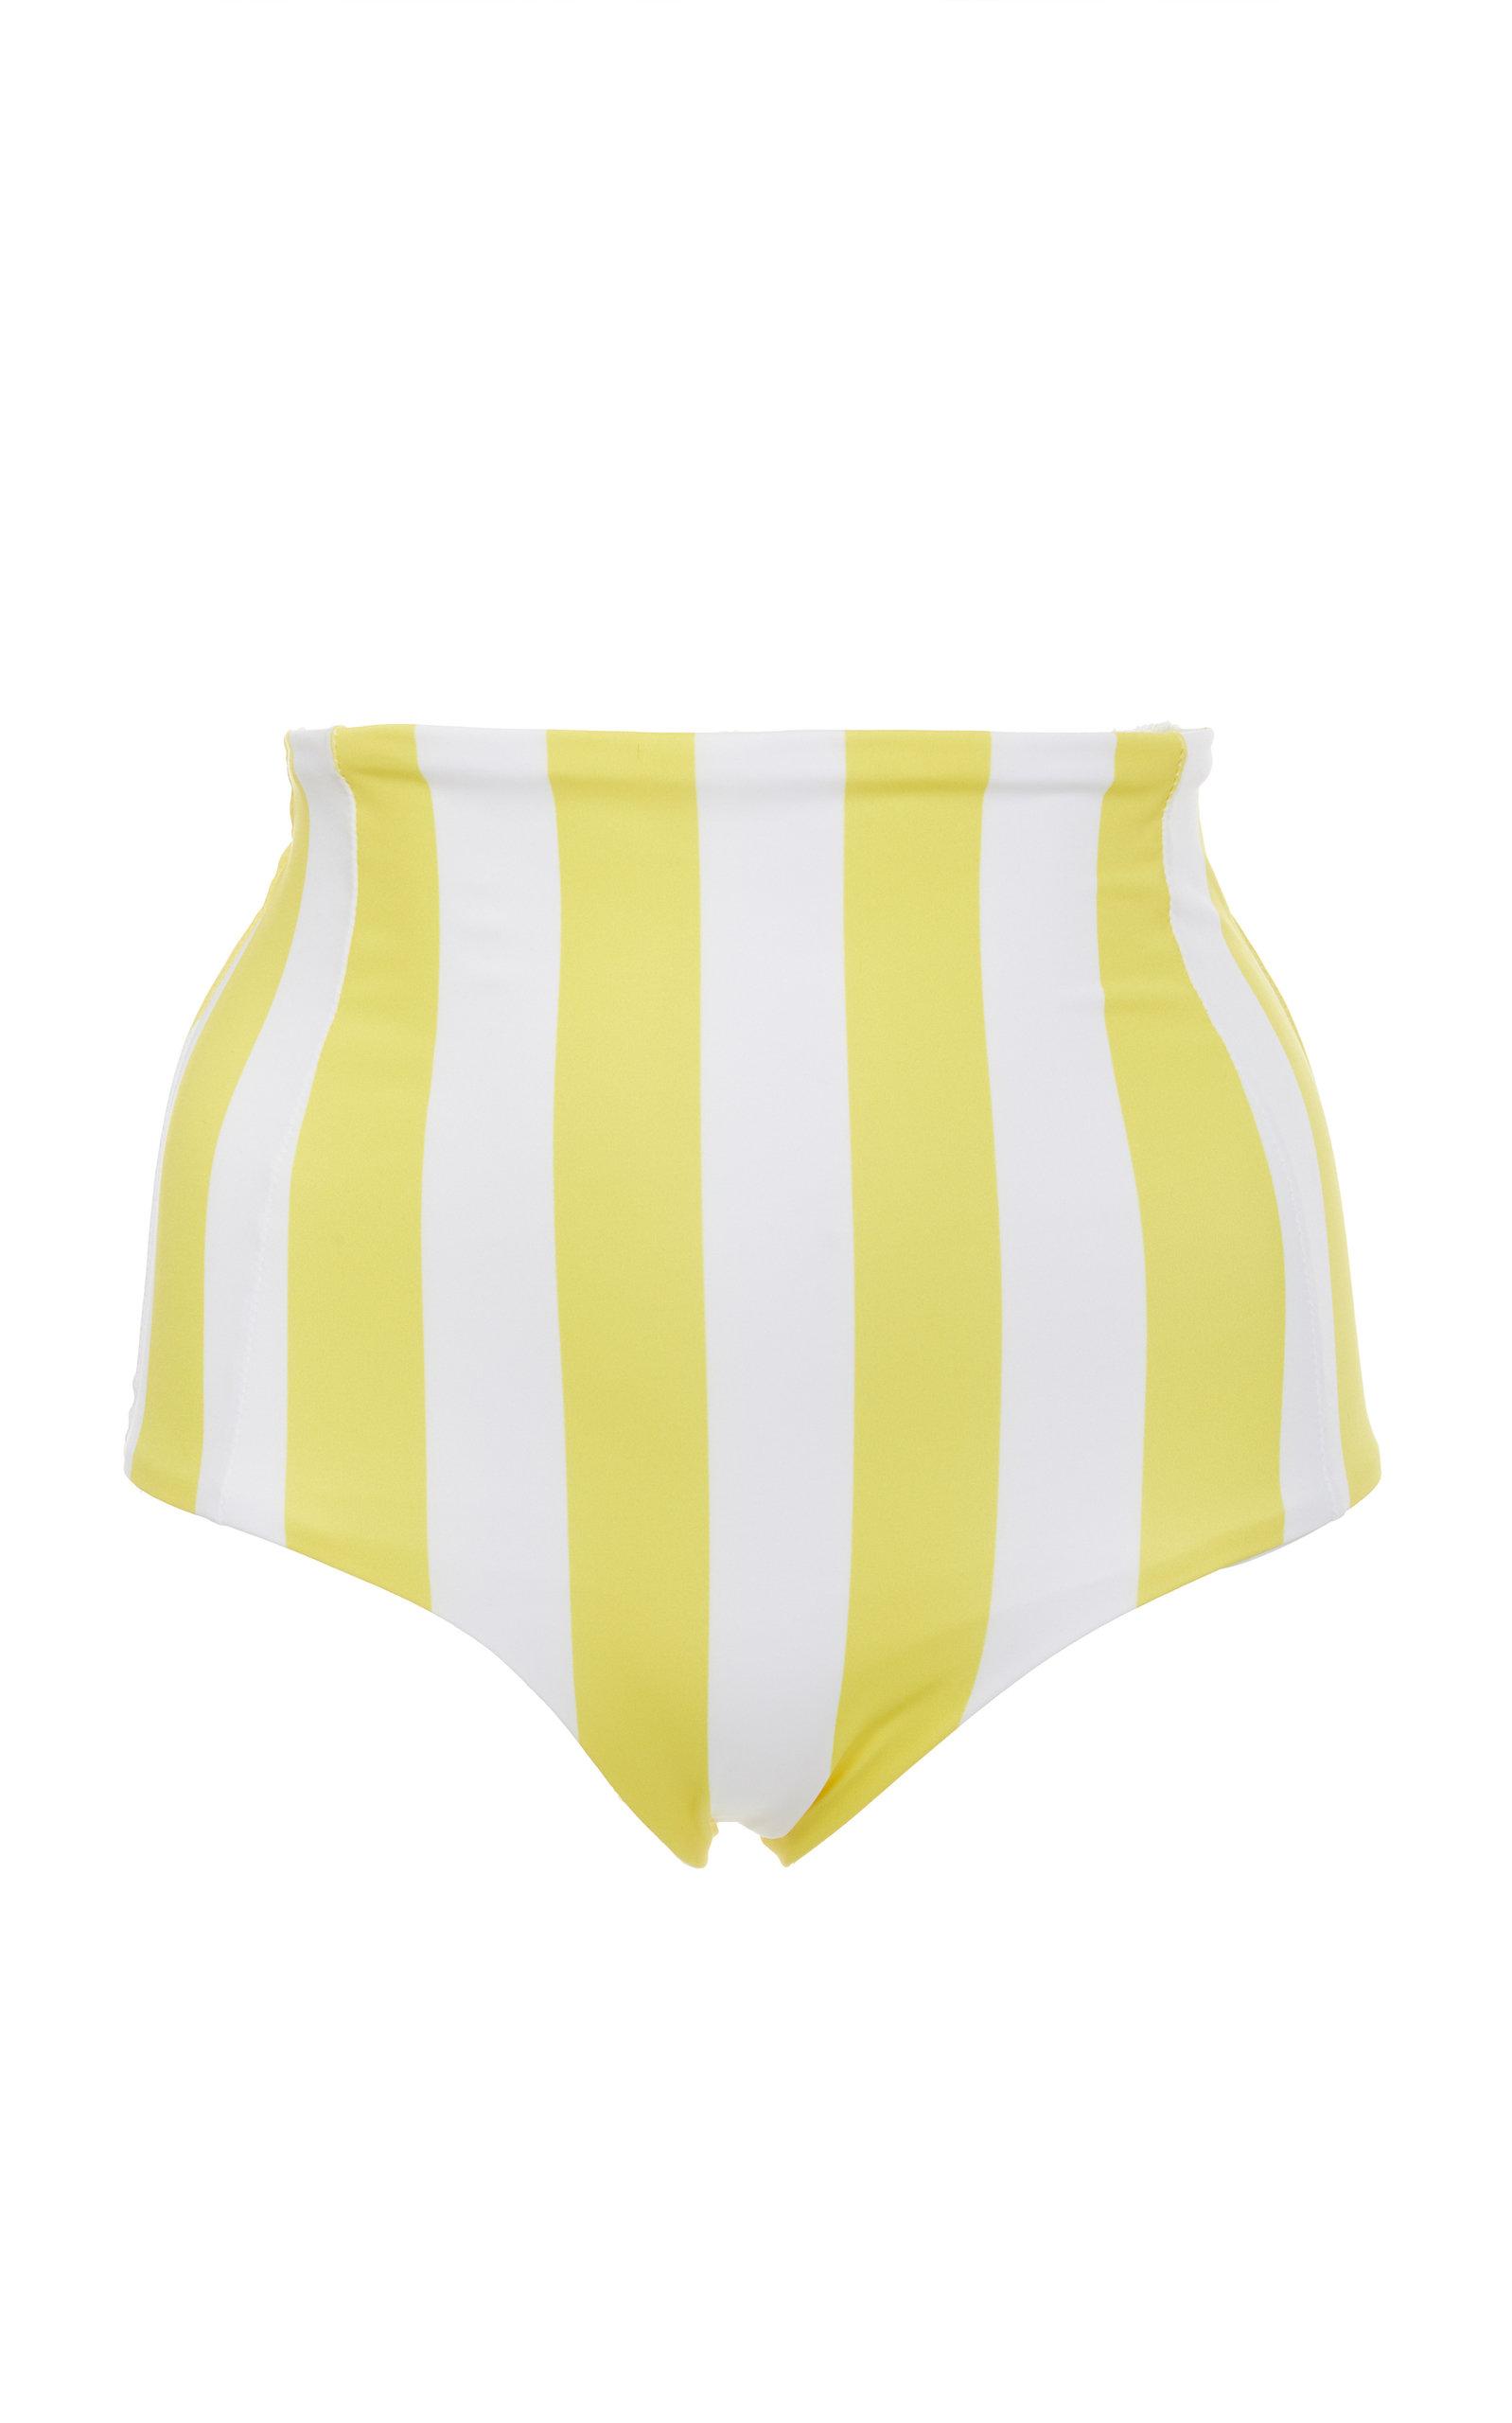 VERDELIMON Banes High Waisted Bikini Bottoms in Yellow